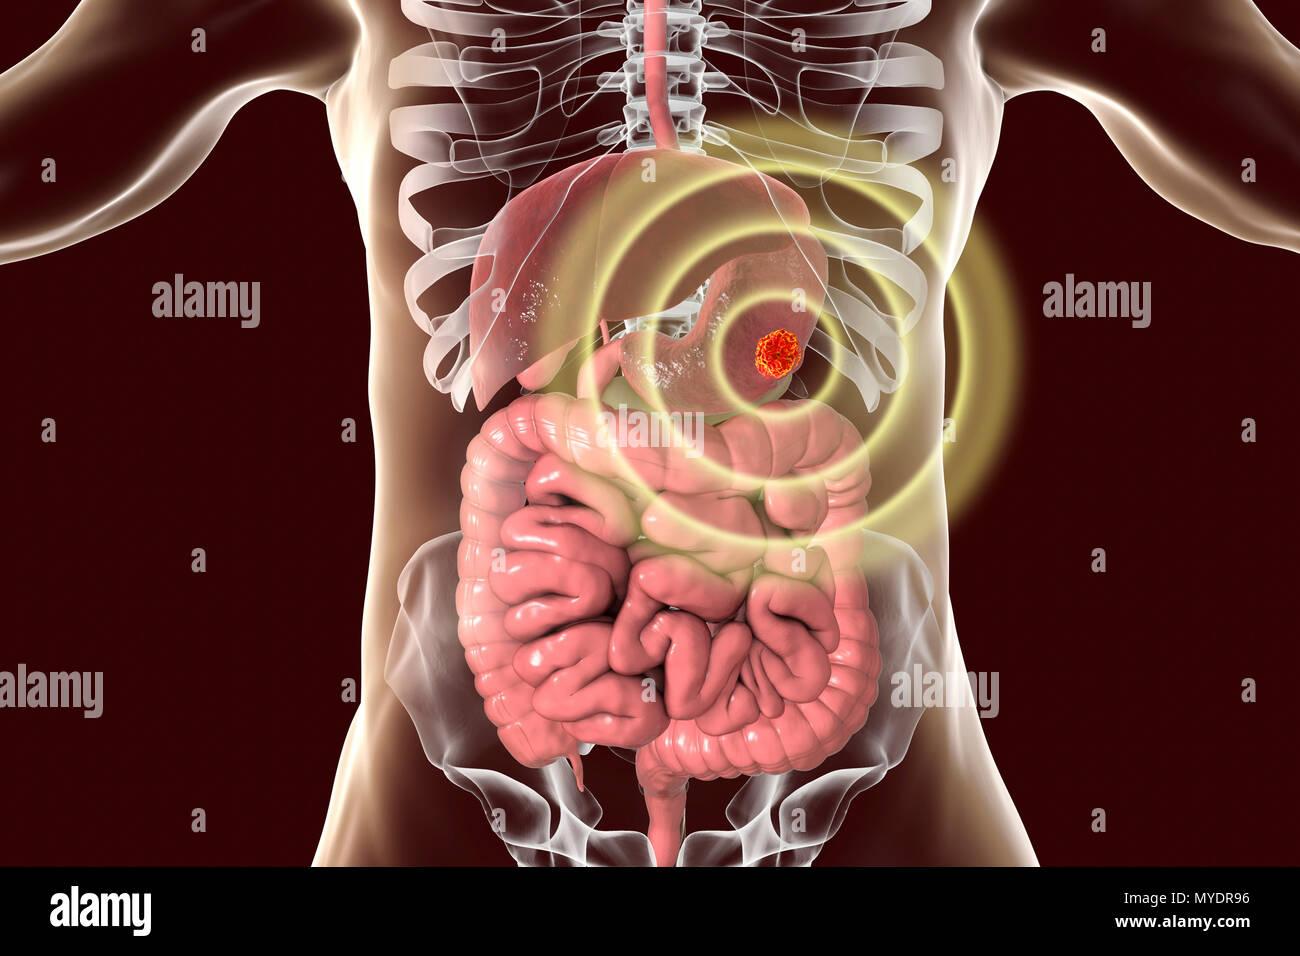 Anatomy Of An Illness Stock Photos Anatomy Of An Illness Stock